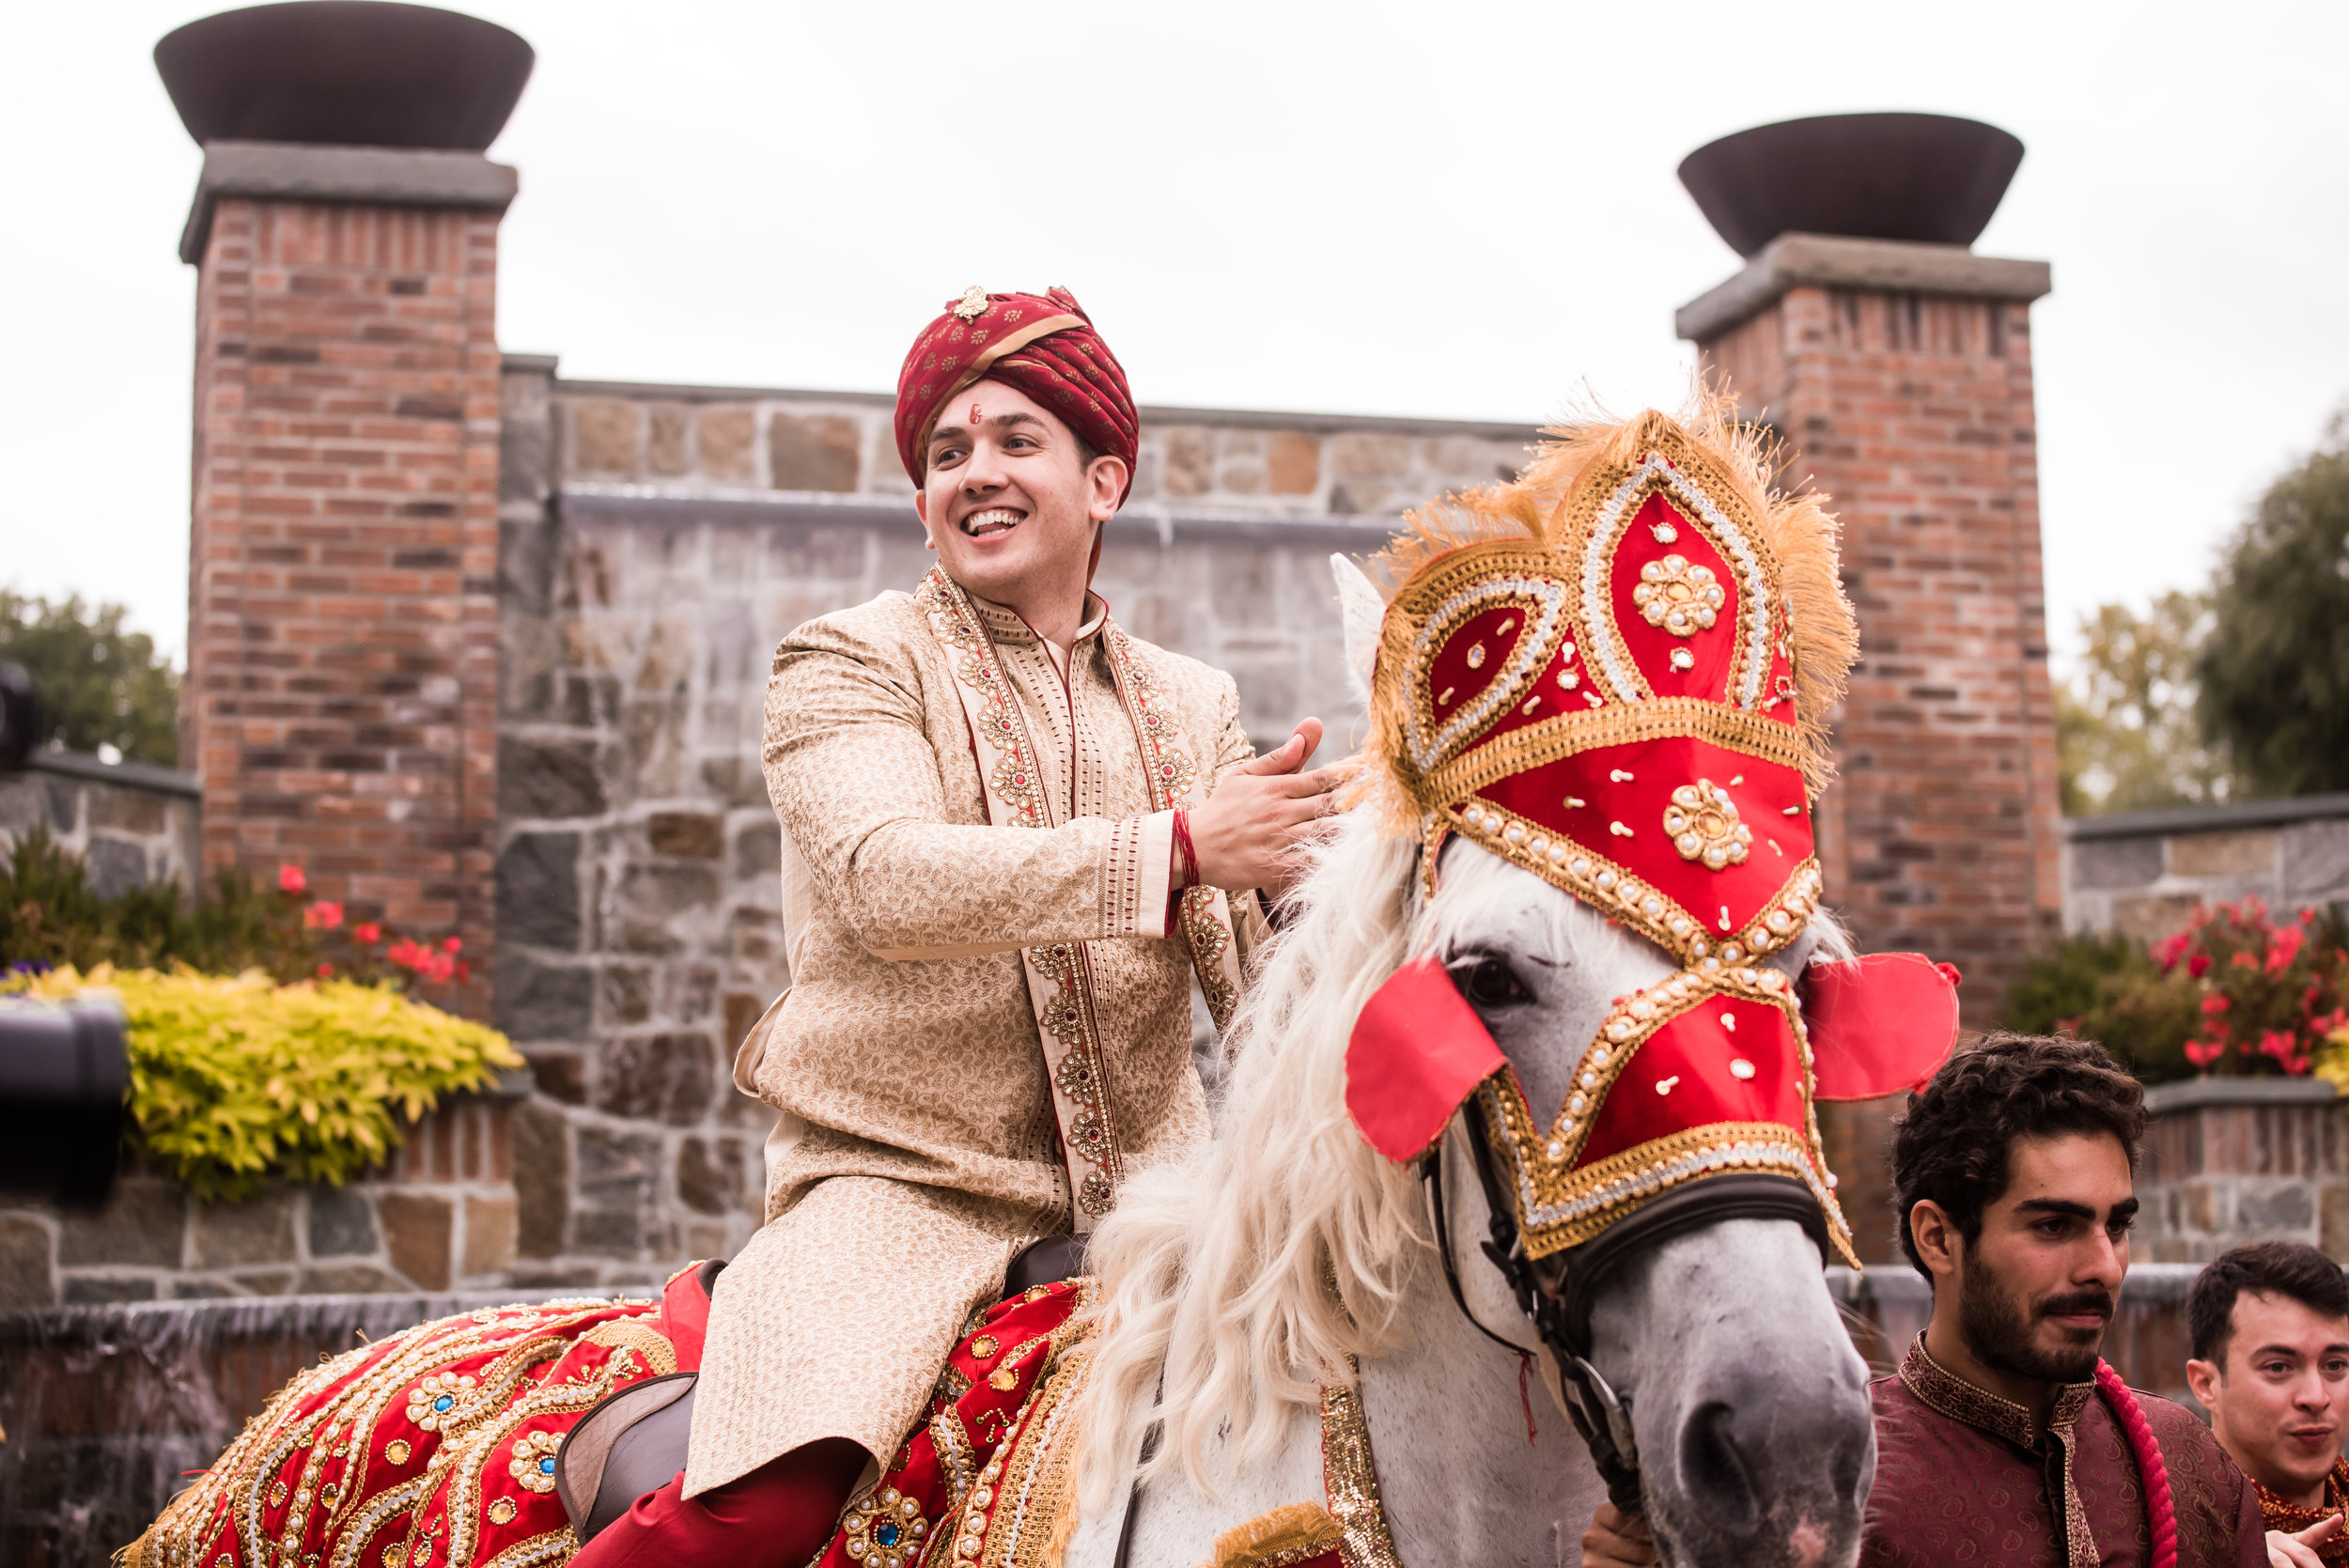 INDIAN WEDDING GROOM ON HORSE.jpg